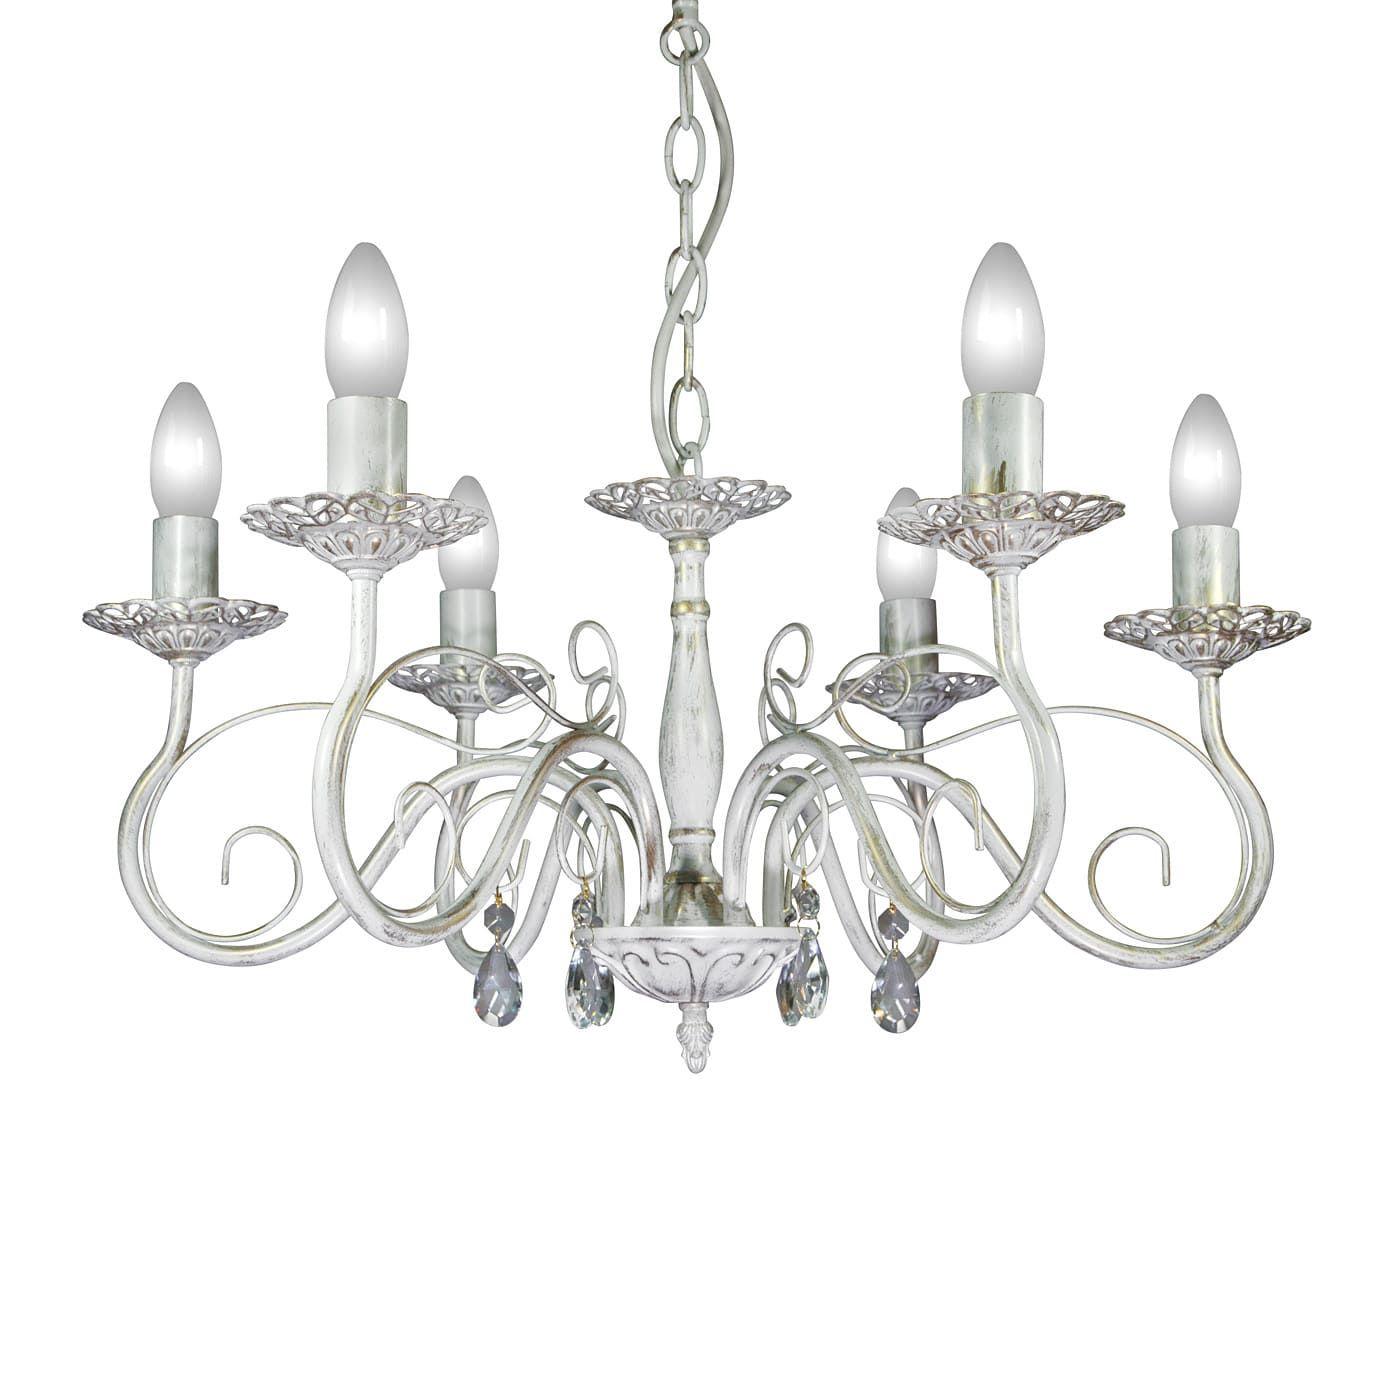 PETRASVET / Pendant chandelier S1164-6, 6xE14 max. 60W